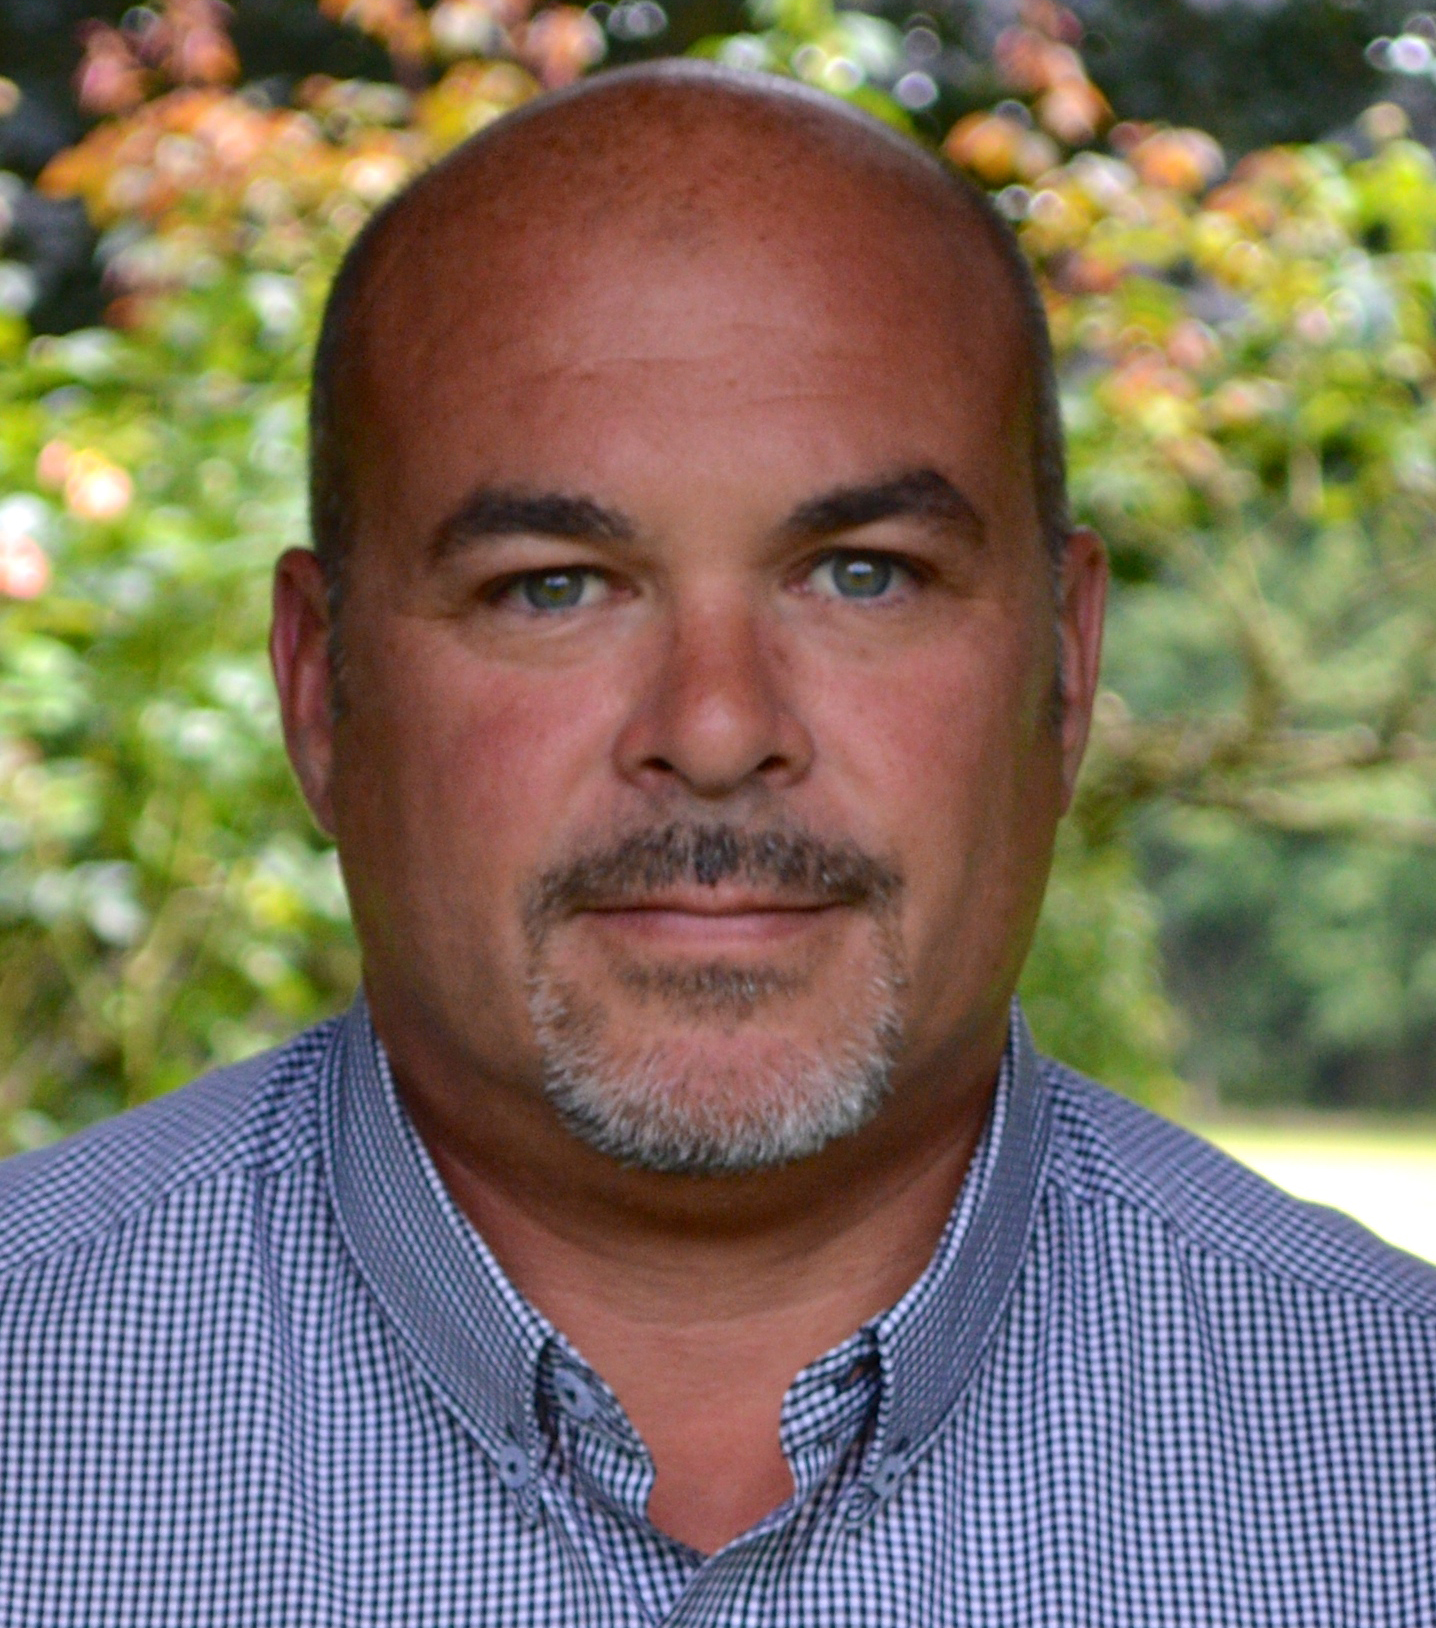 Mark Allen Instructor at CNet Training